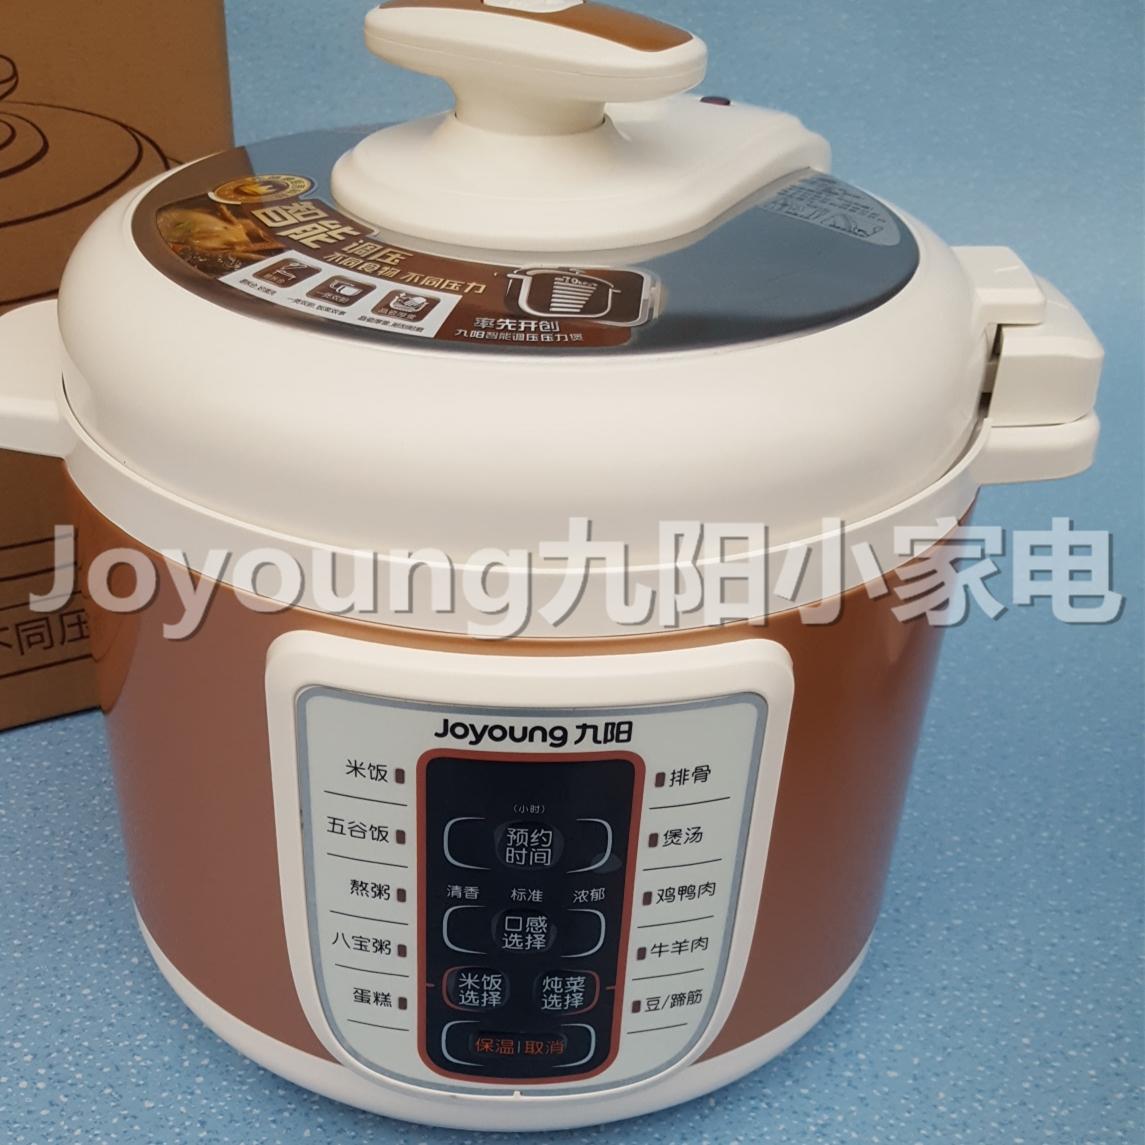 Joyoung/九阳 JYY-50YL6家用全自动电压力锅双胆高压锅电压力煲